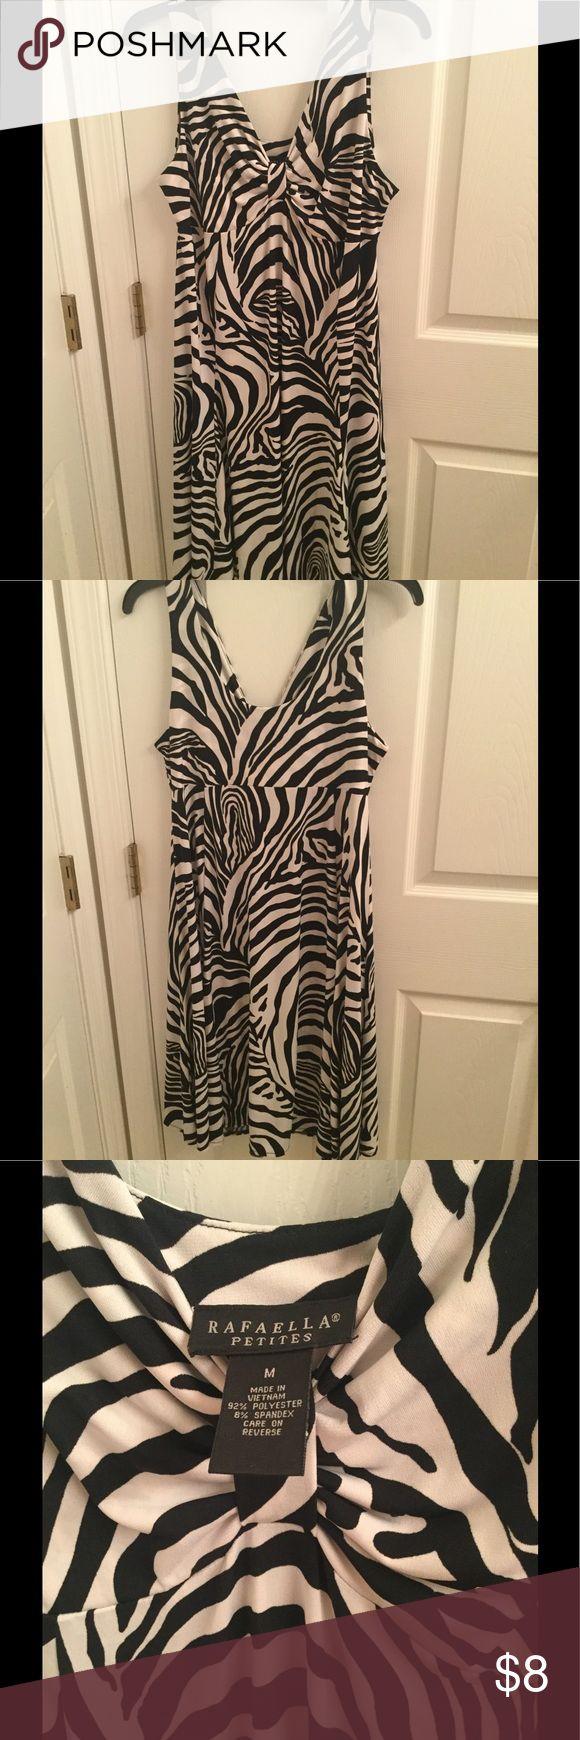 Rafaella Petites dress Used Black and white dress Rafaella Dresses Midi